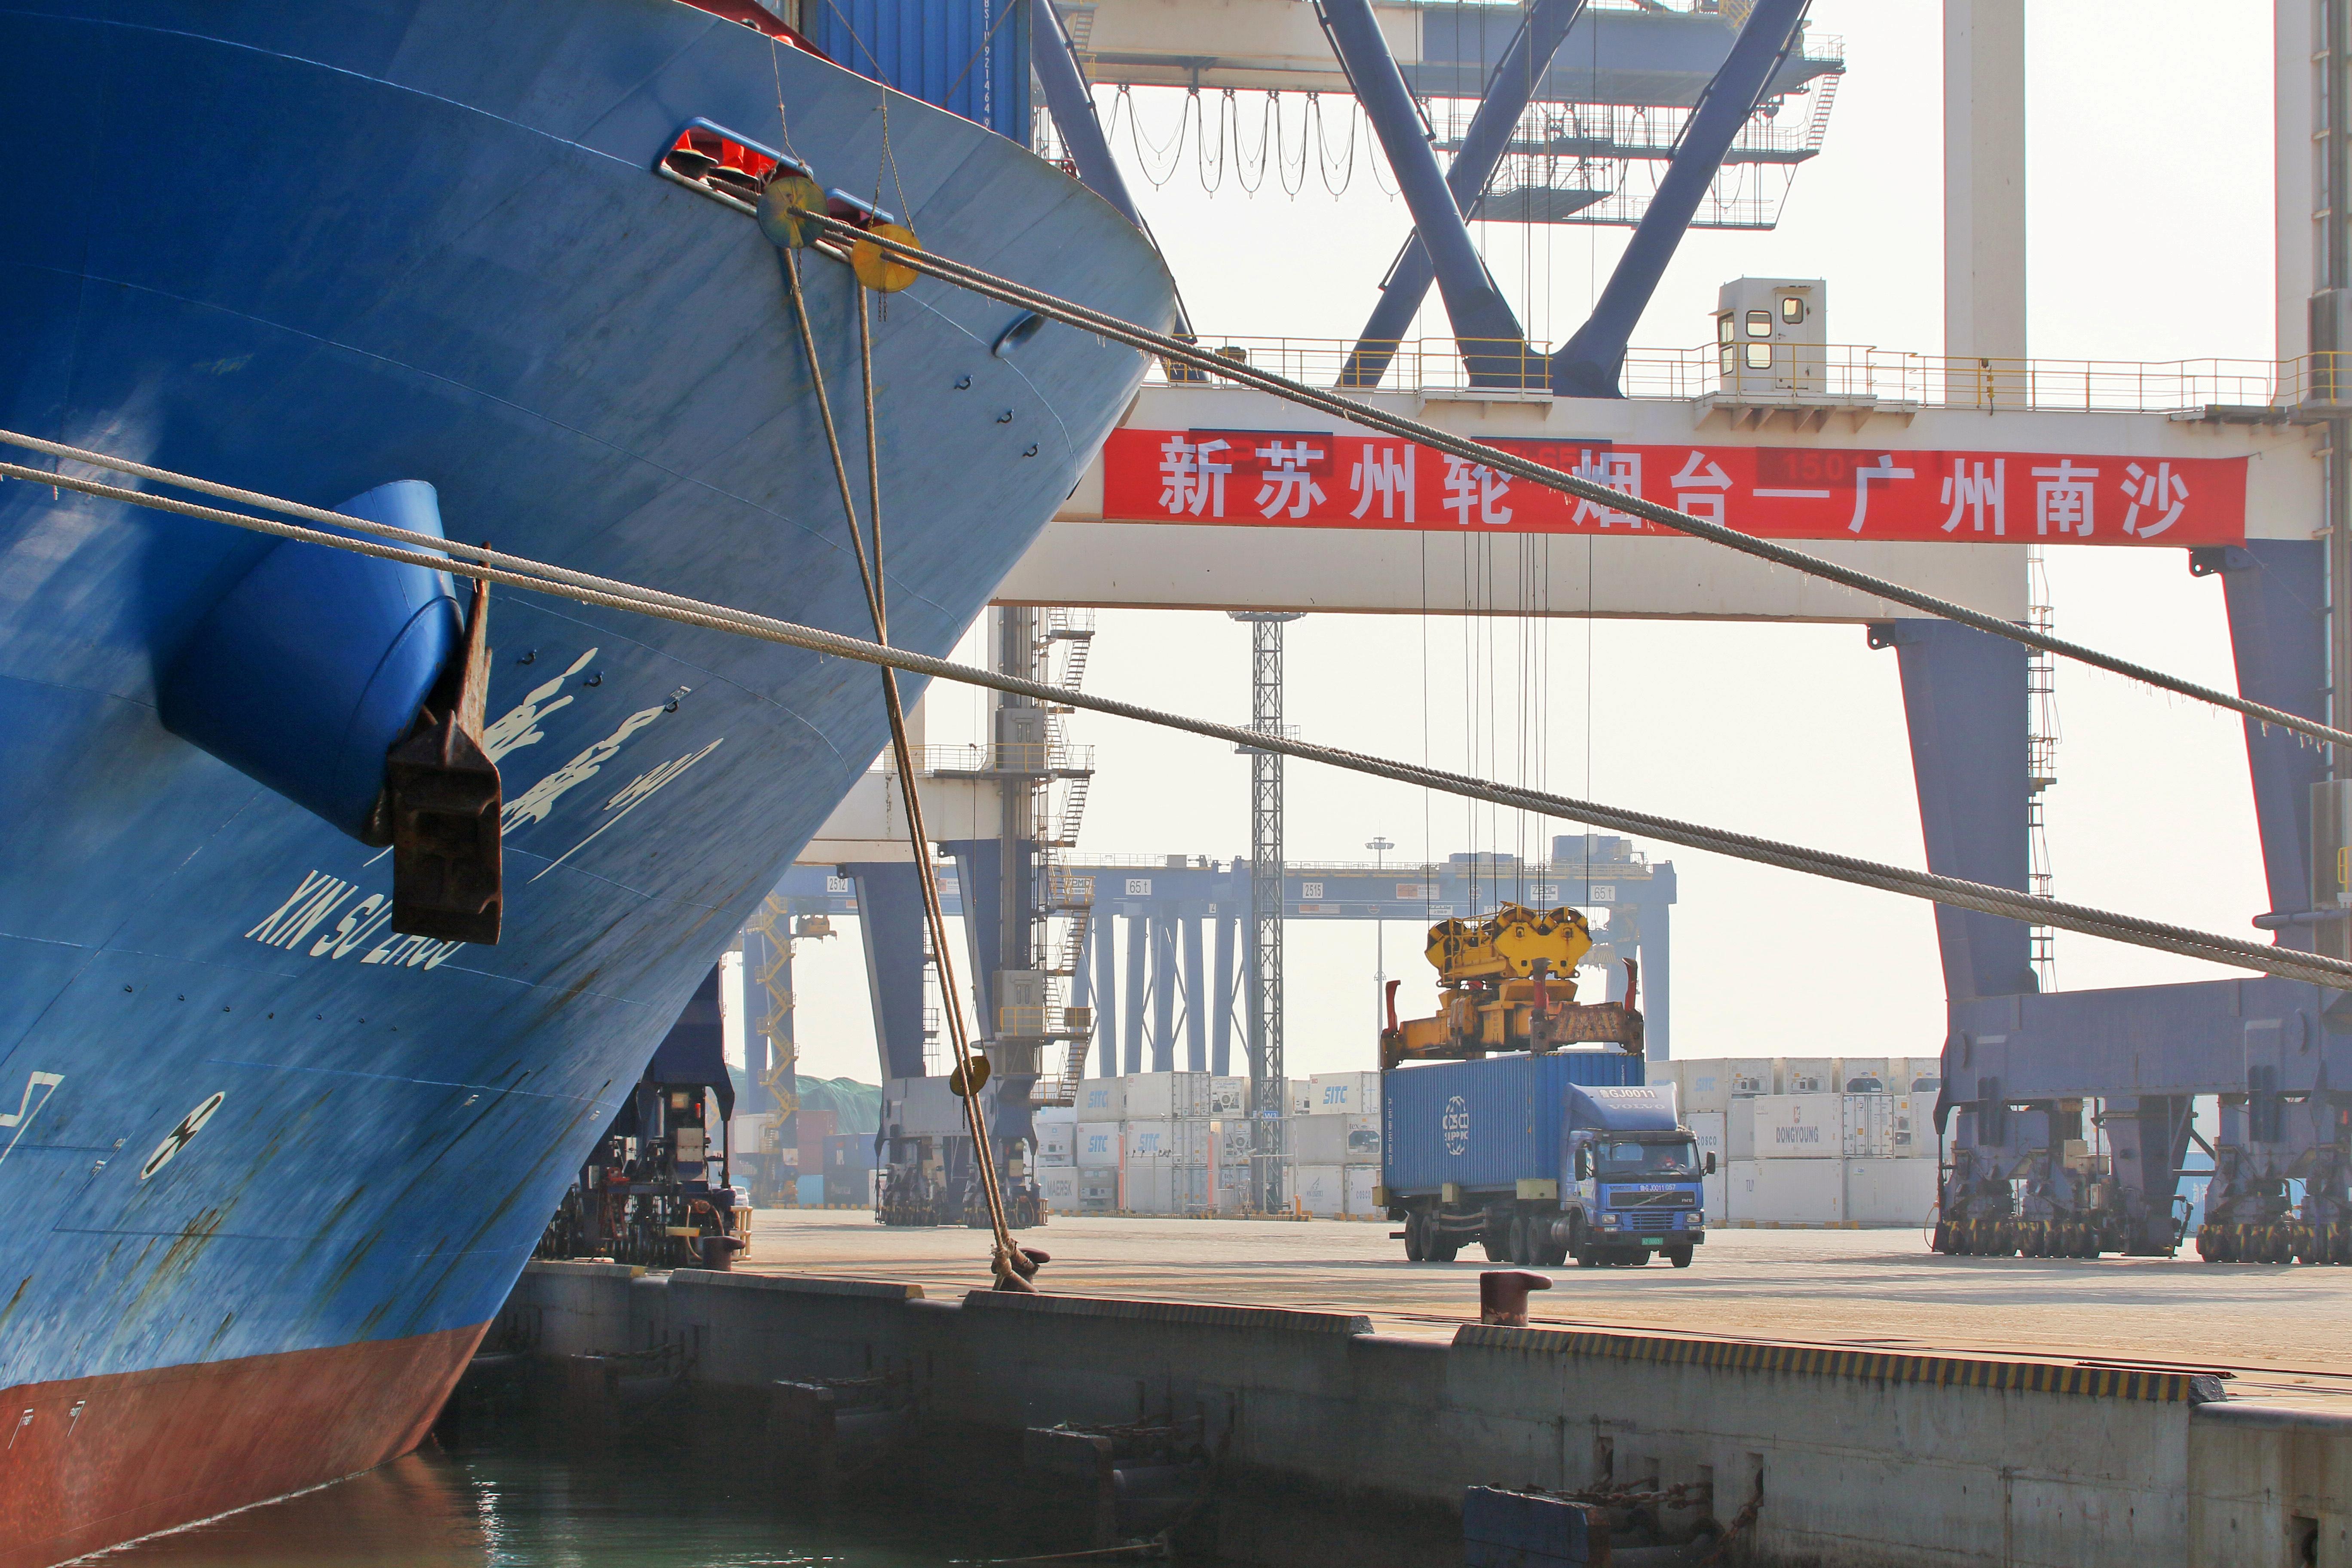 Six warning lights flashing for China's slowing economy